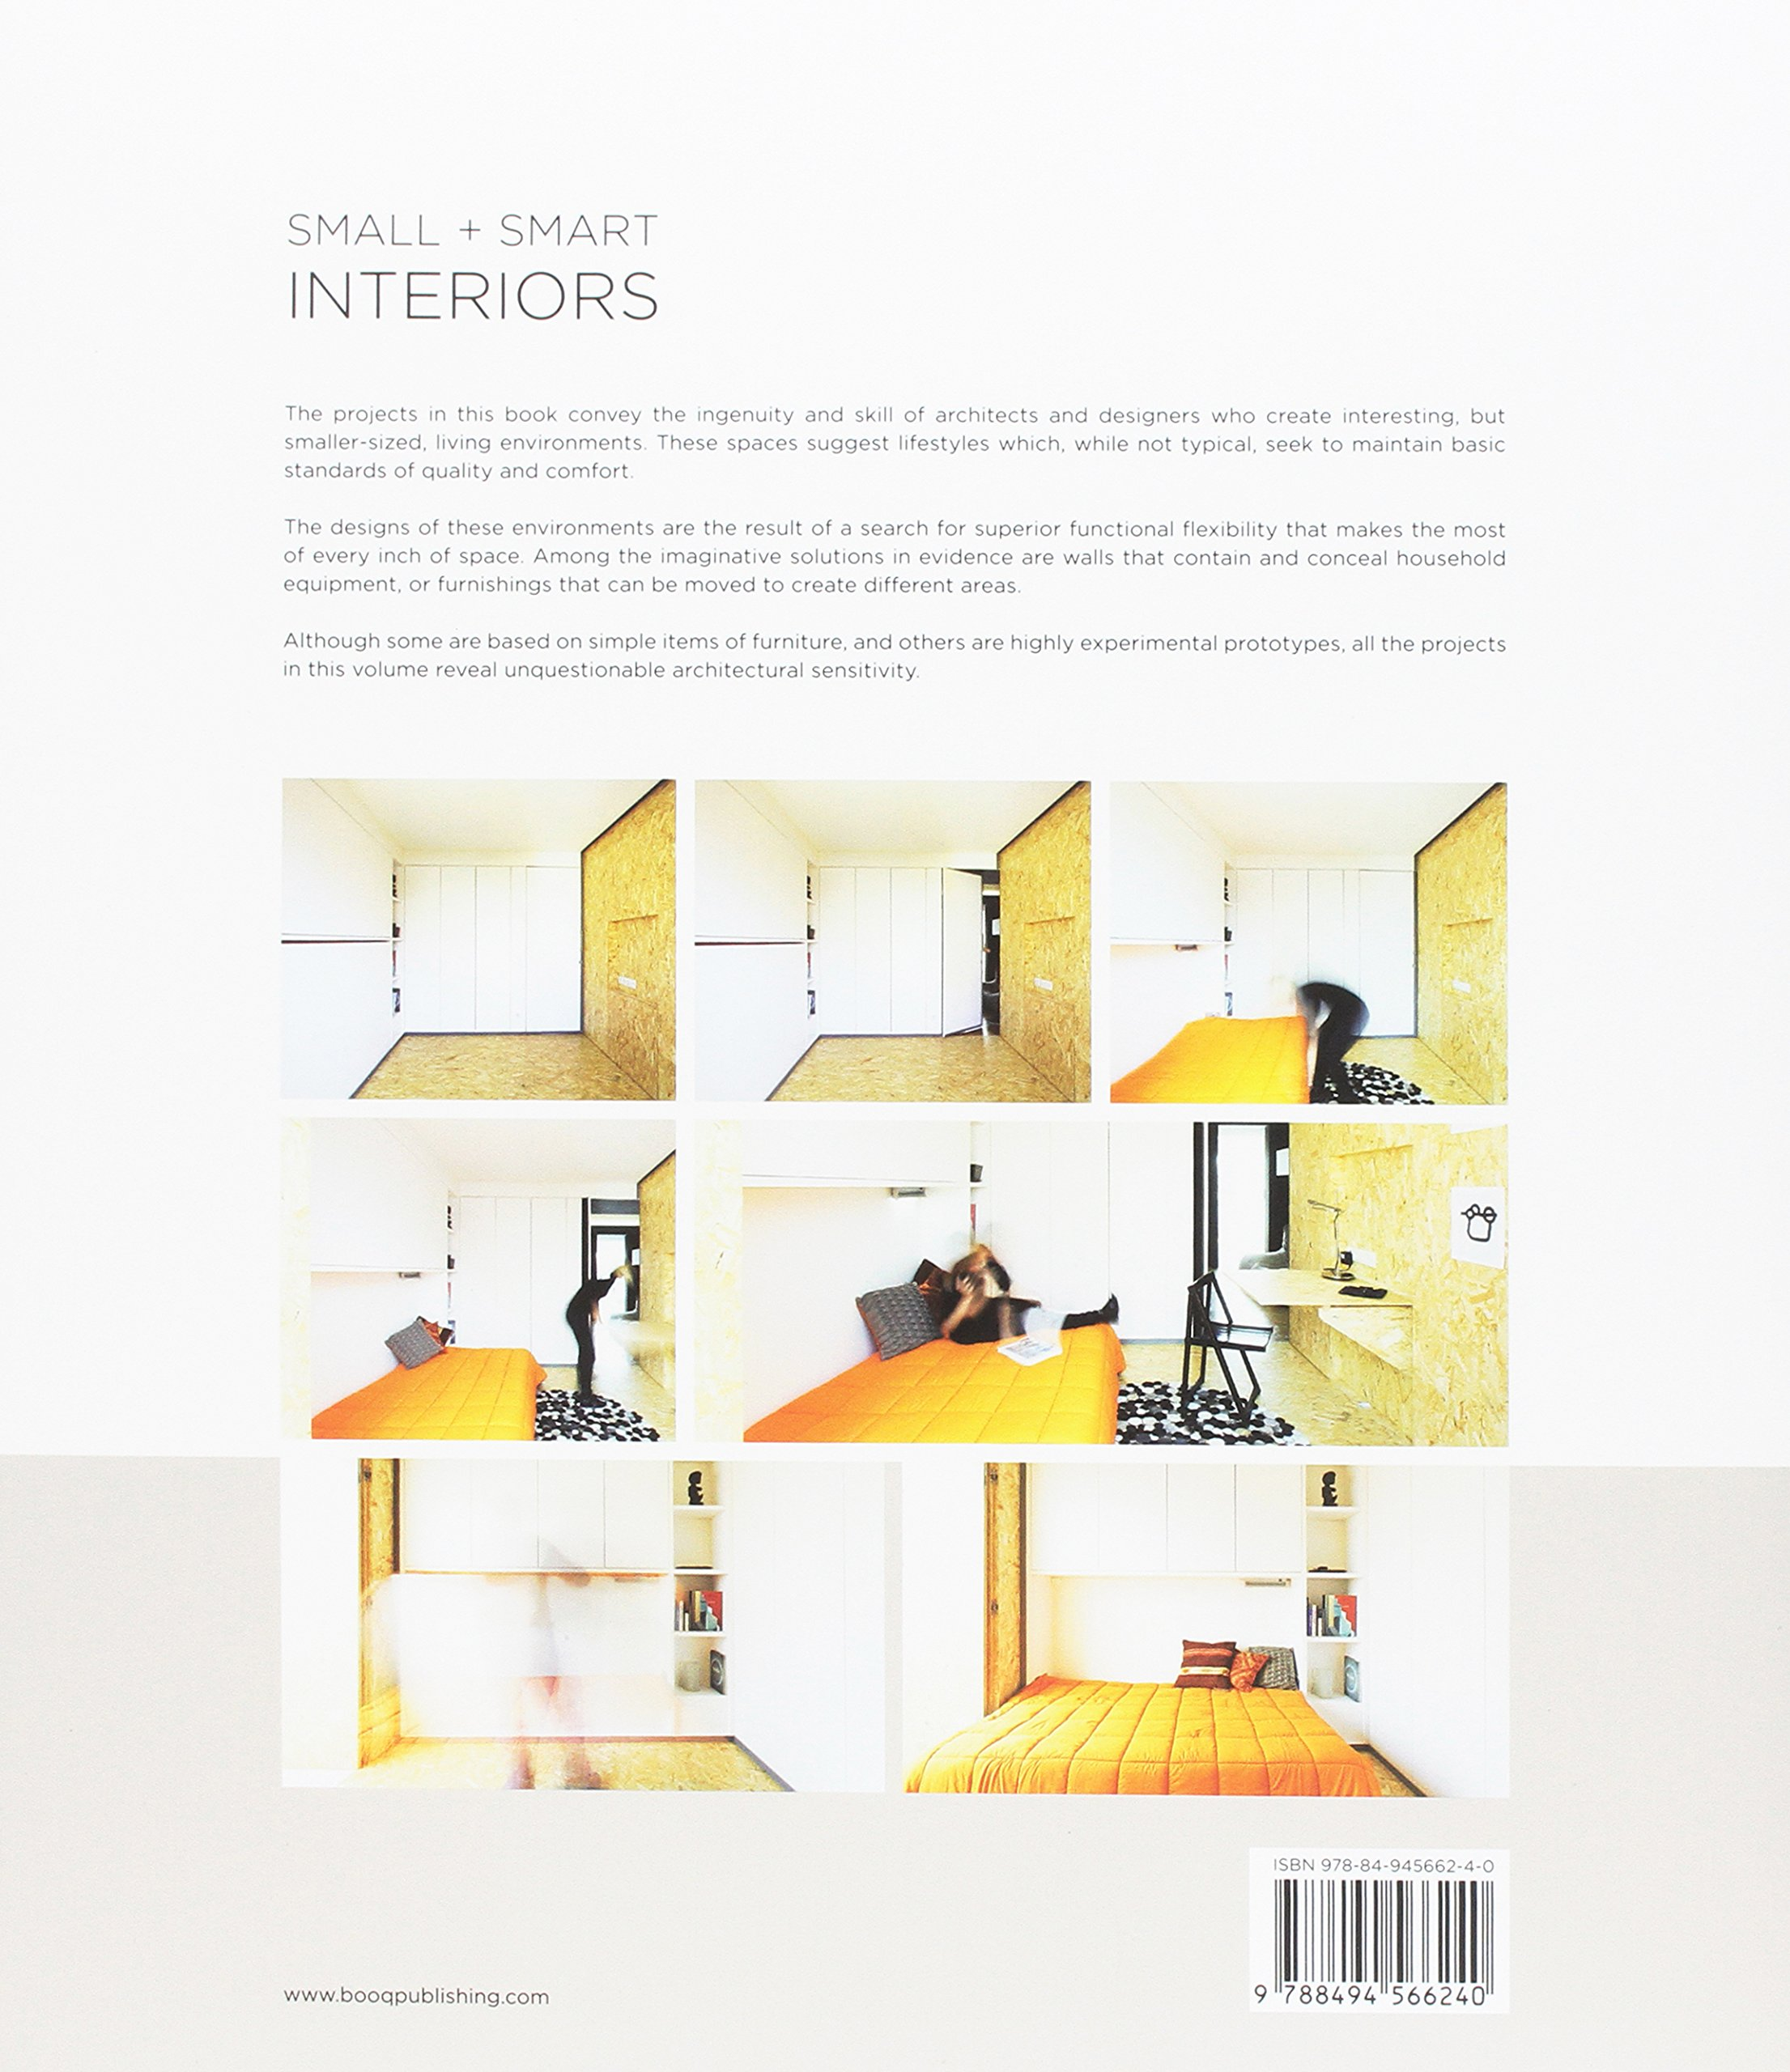 david design small books andreu interiors com textbooks interior bach amazon dp smart